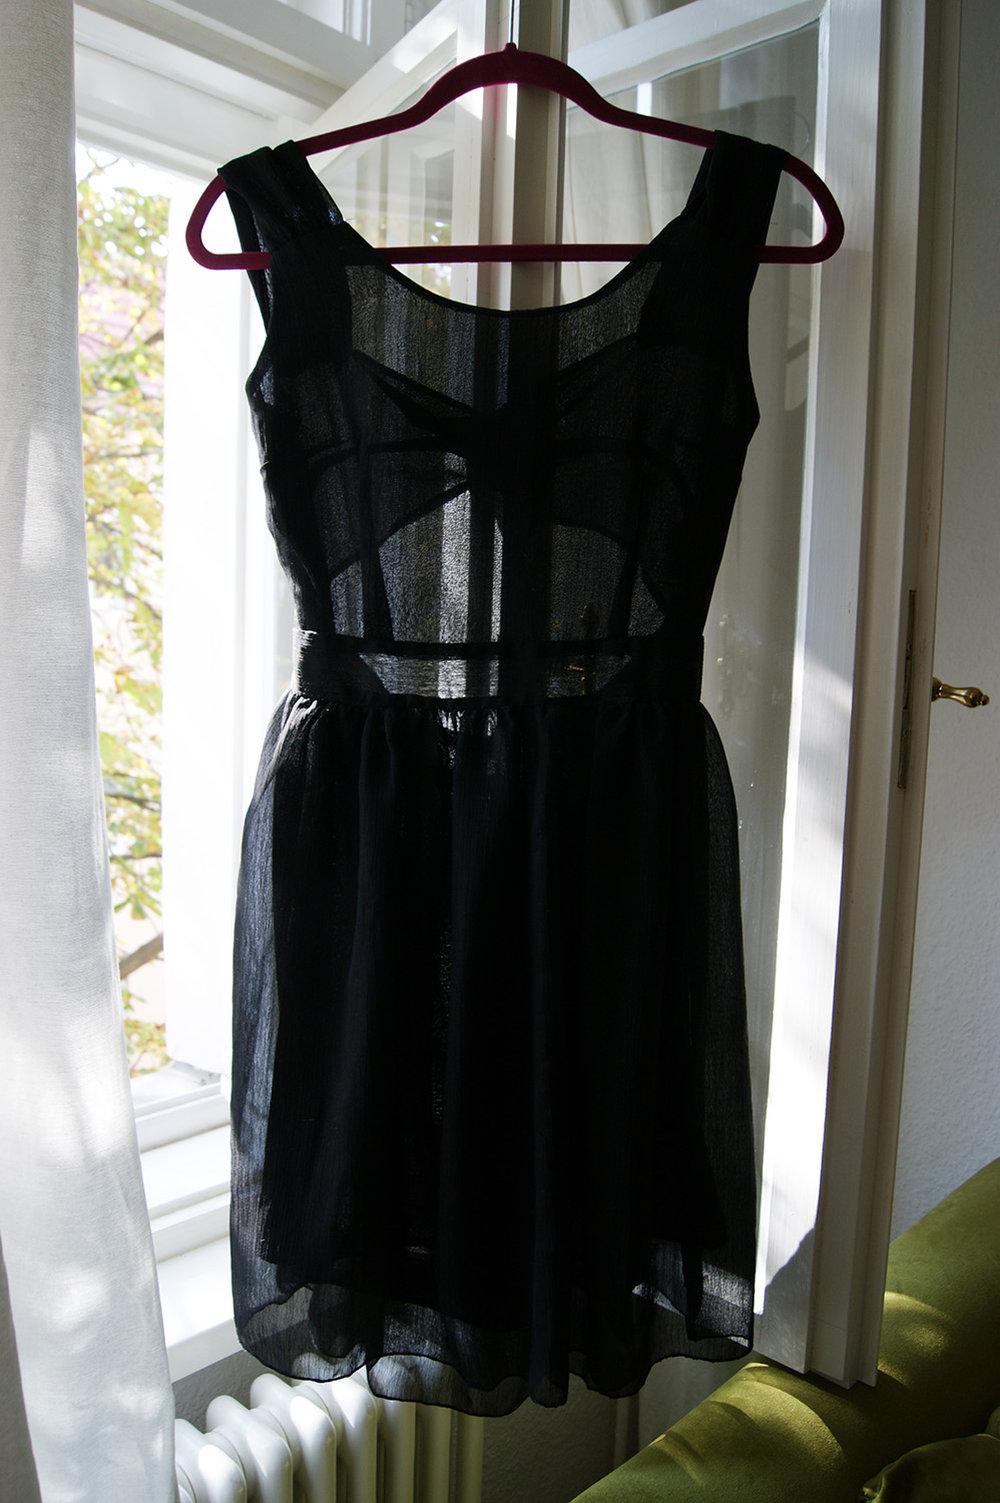 kleid schwarz kurz rückenfrei transparent xs